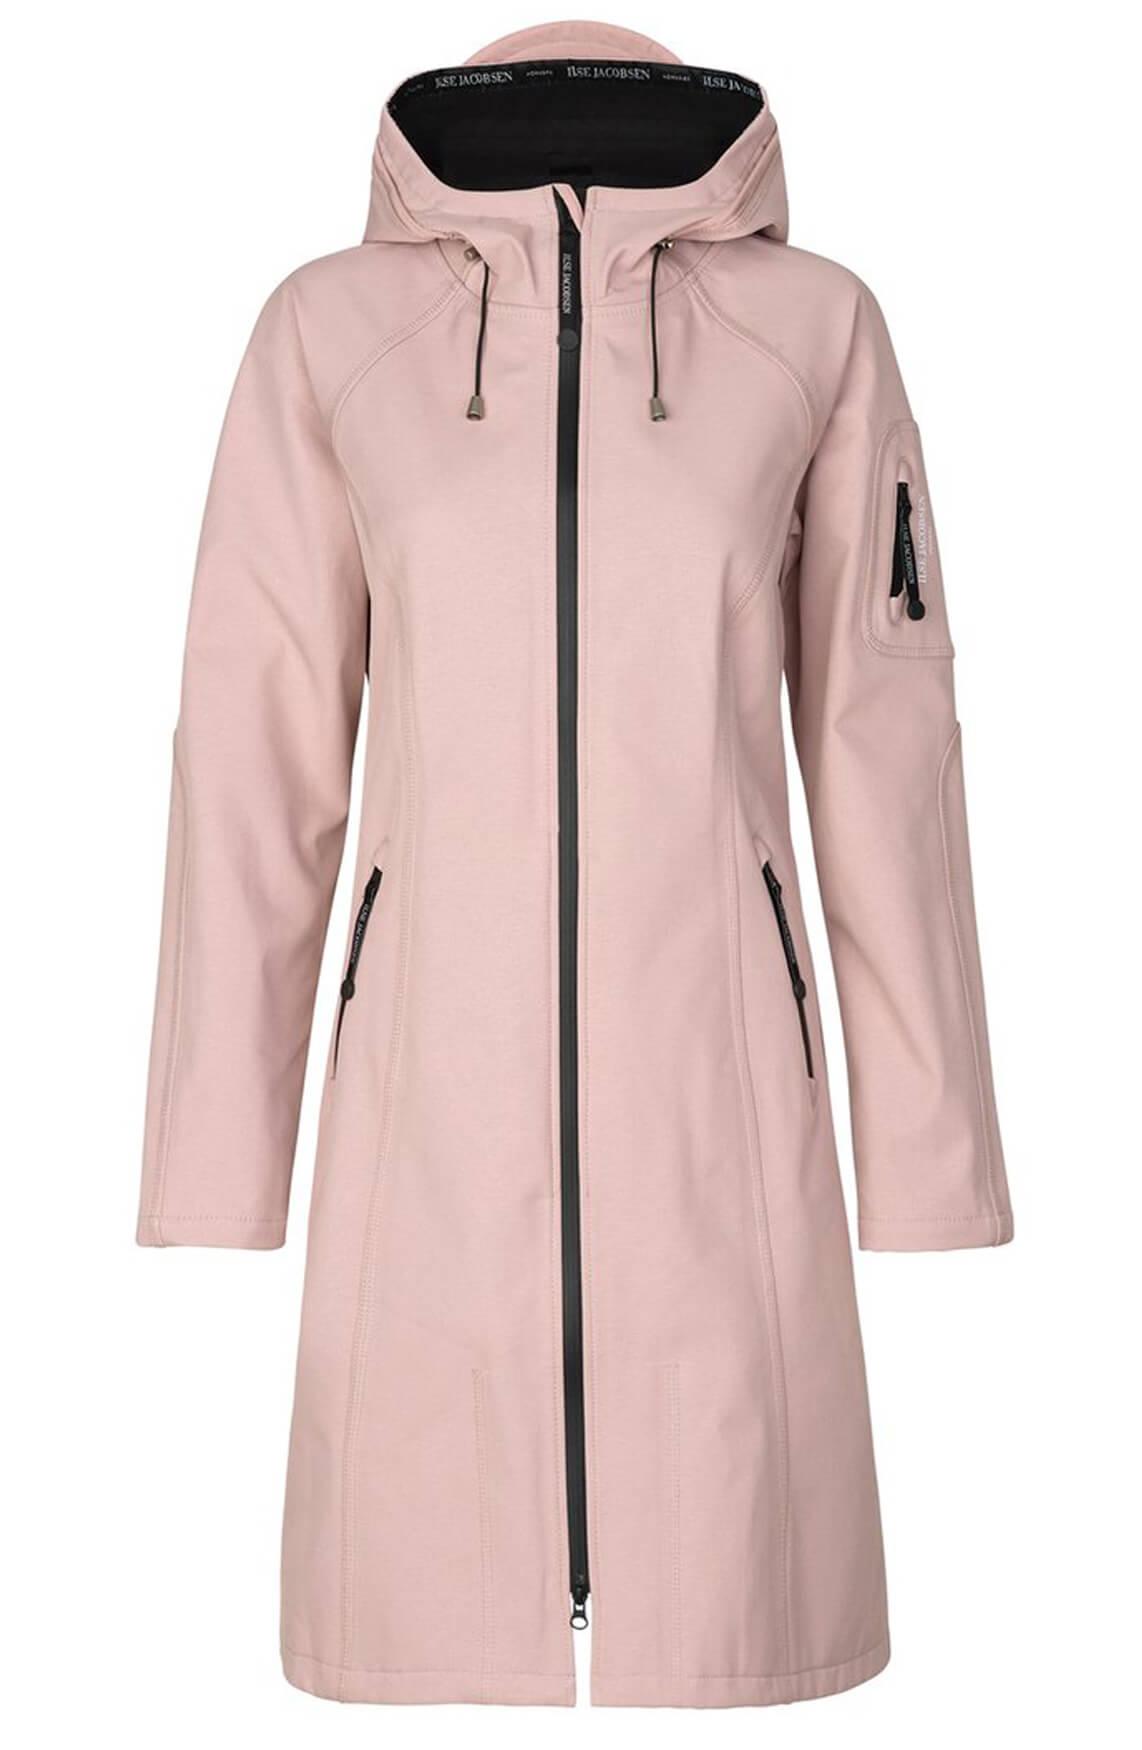 Ilse Jacobsen Dames Softshell regenjas roze